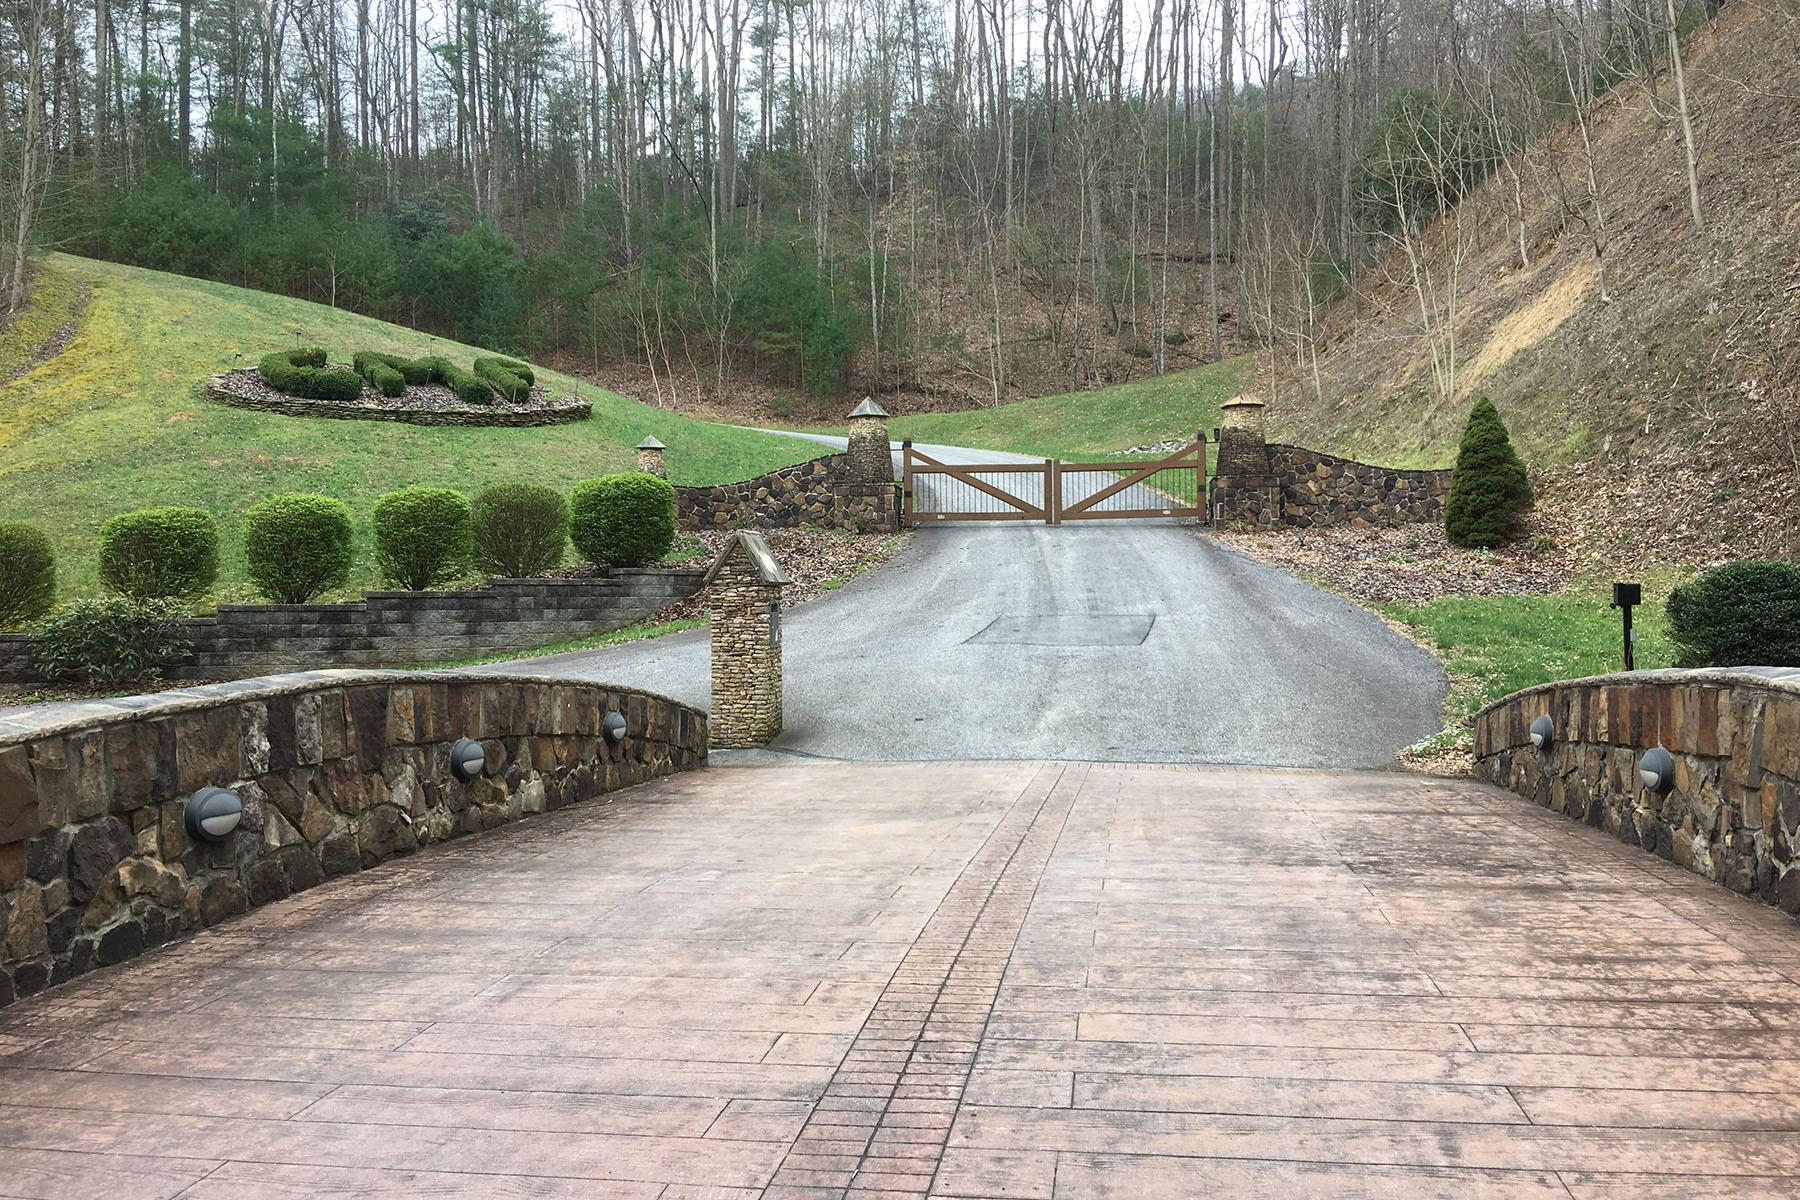 Land for Sale at CHESTNUT MOUNTAIN FARMS - MCGRADY Lot 135 Chestnut Mountain Farms Pkwy McGrady, North Carolina 28649 United States